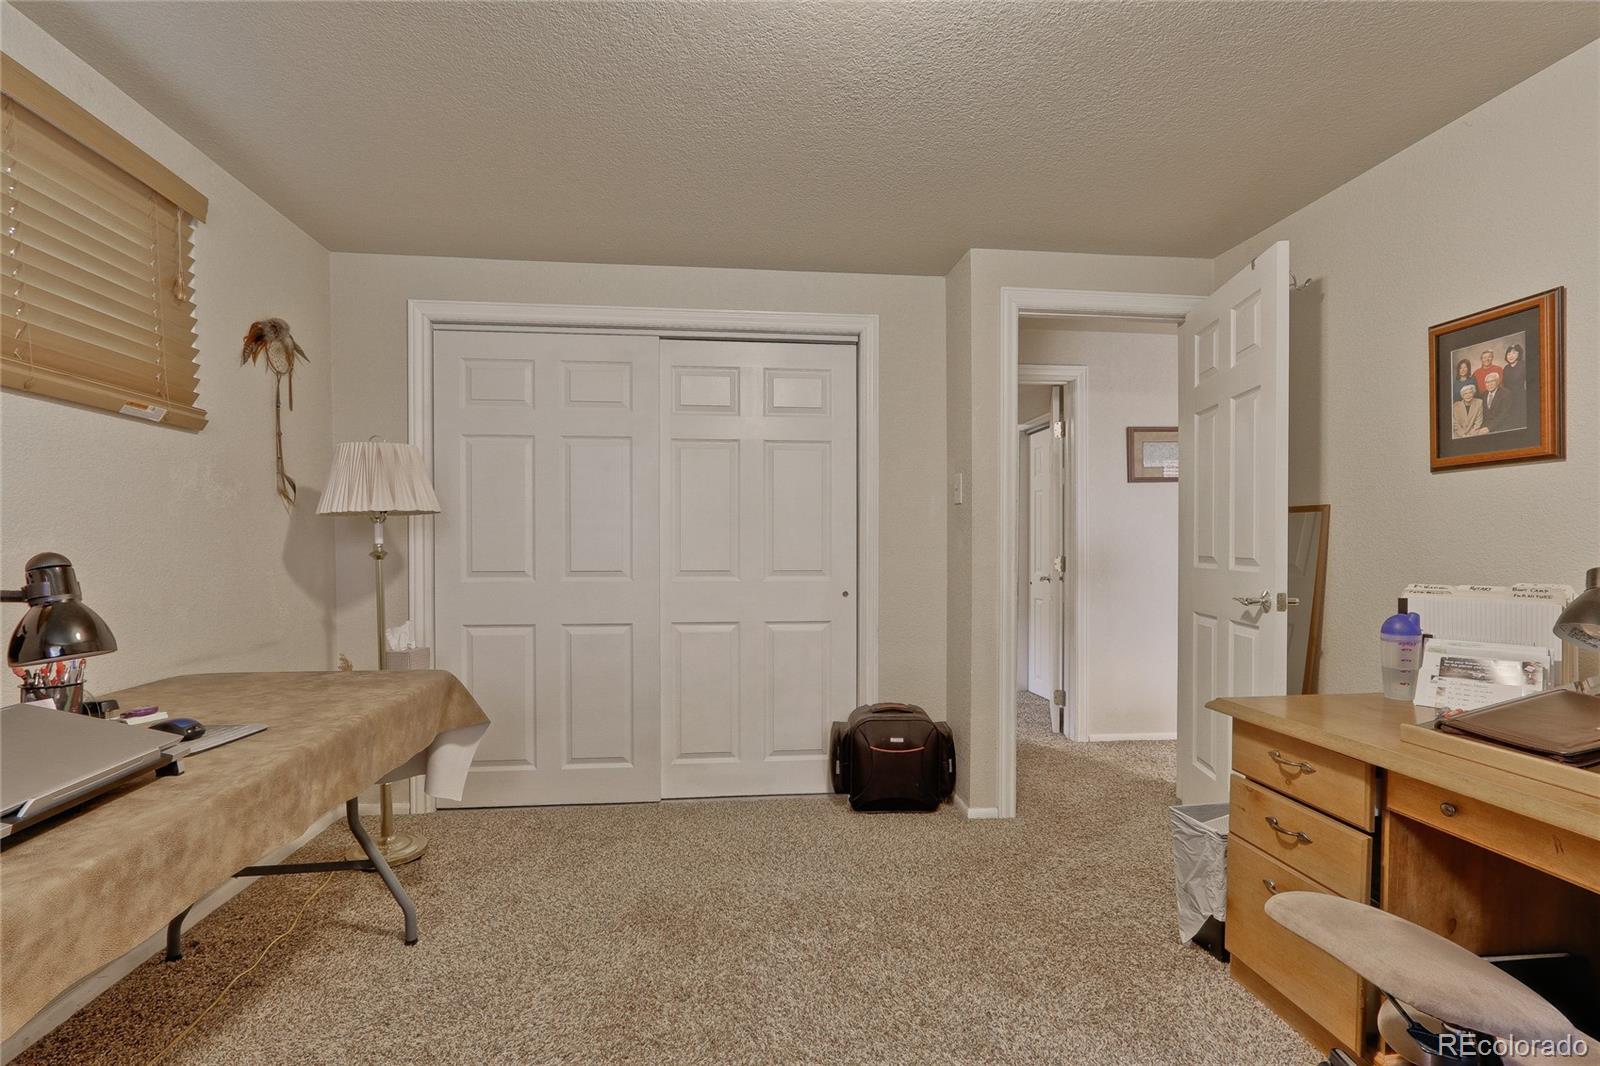 MLS# 6751608 - 25 - 12838 W Arizona Place, Lakewood, CO 80228